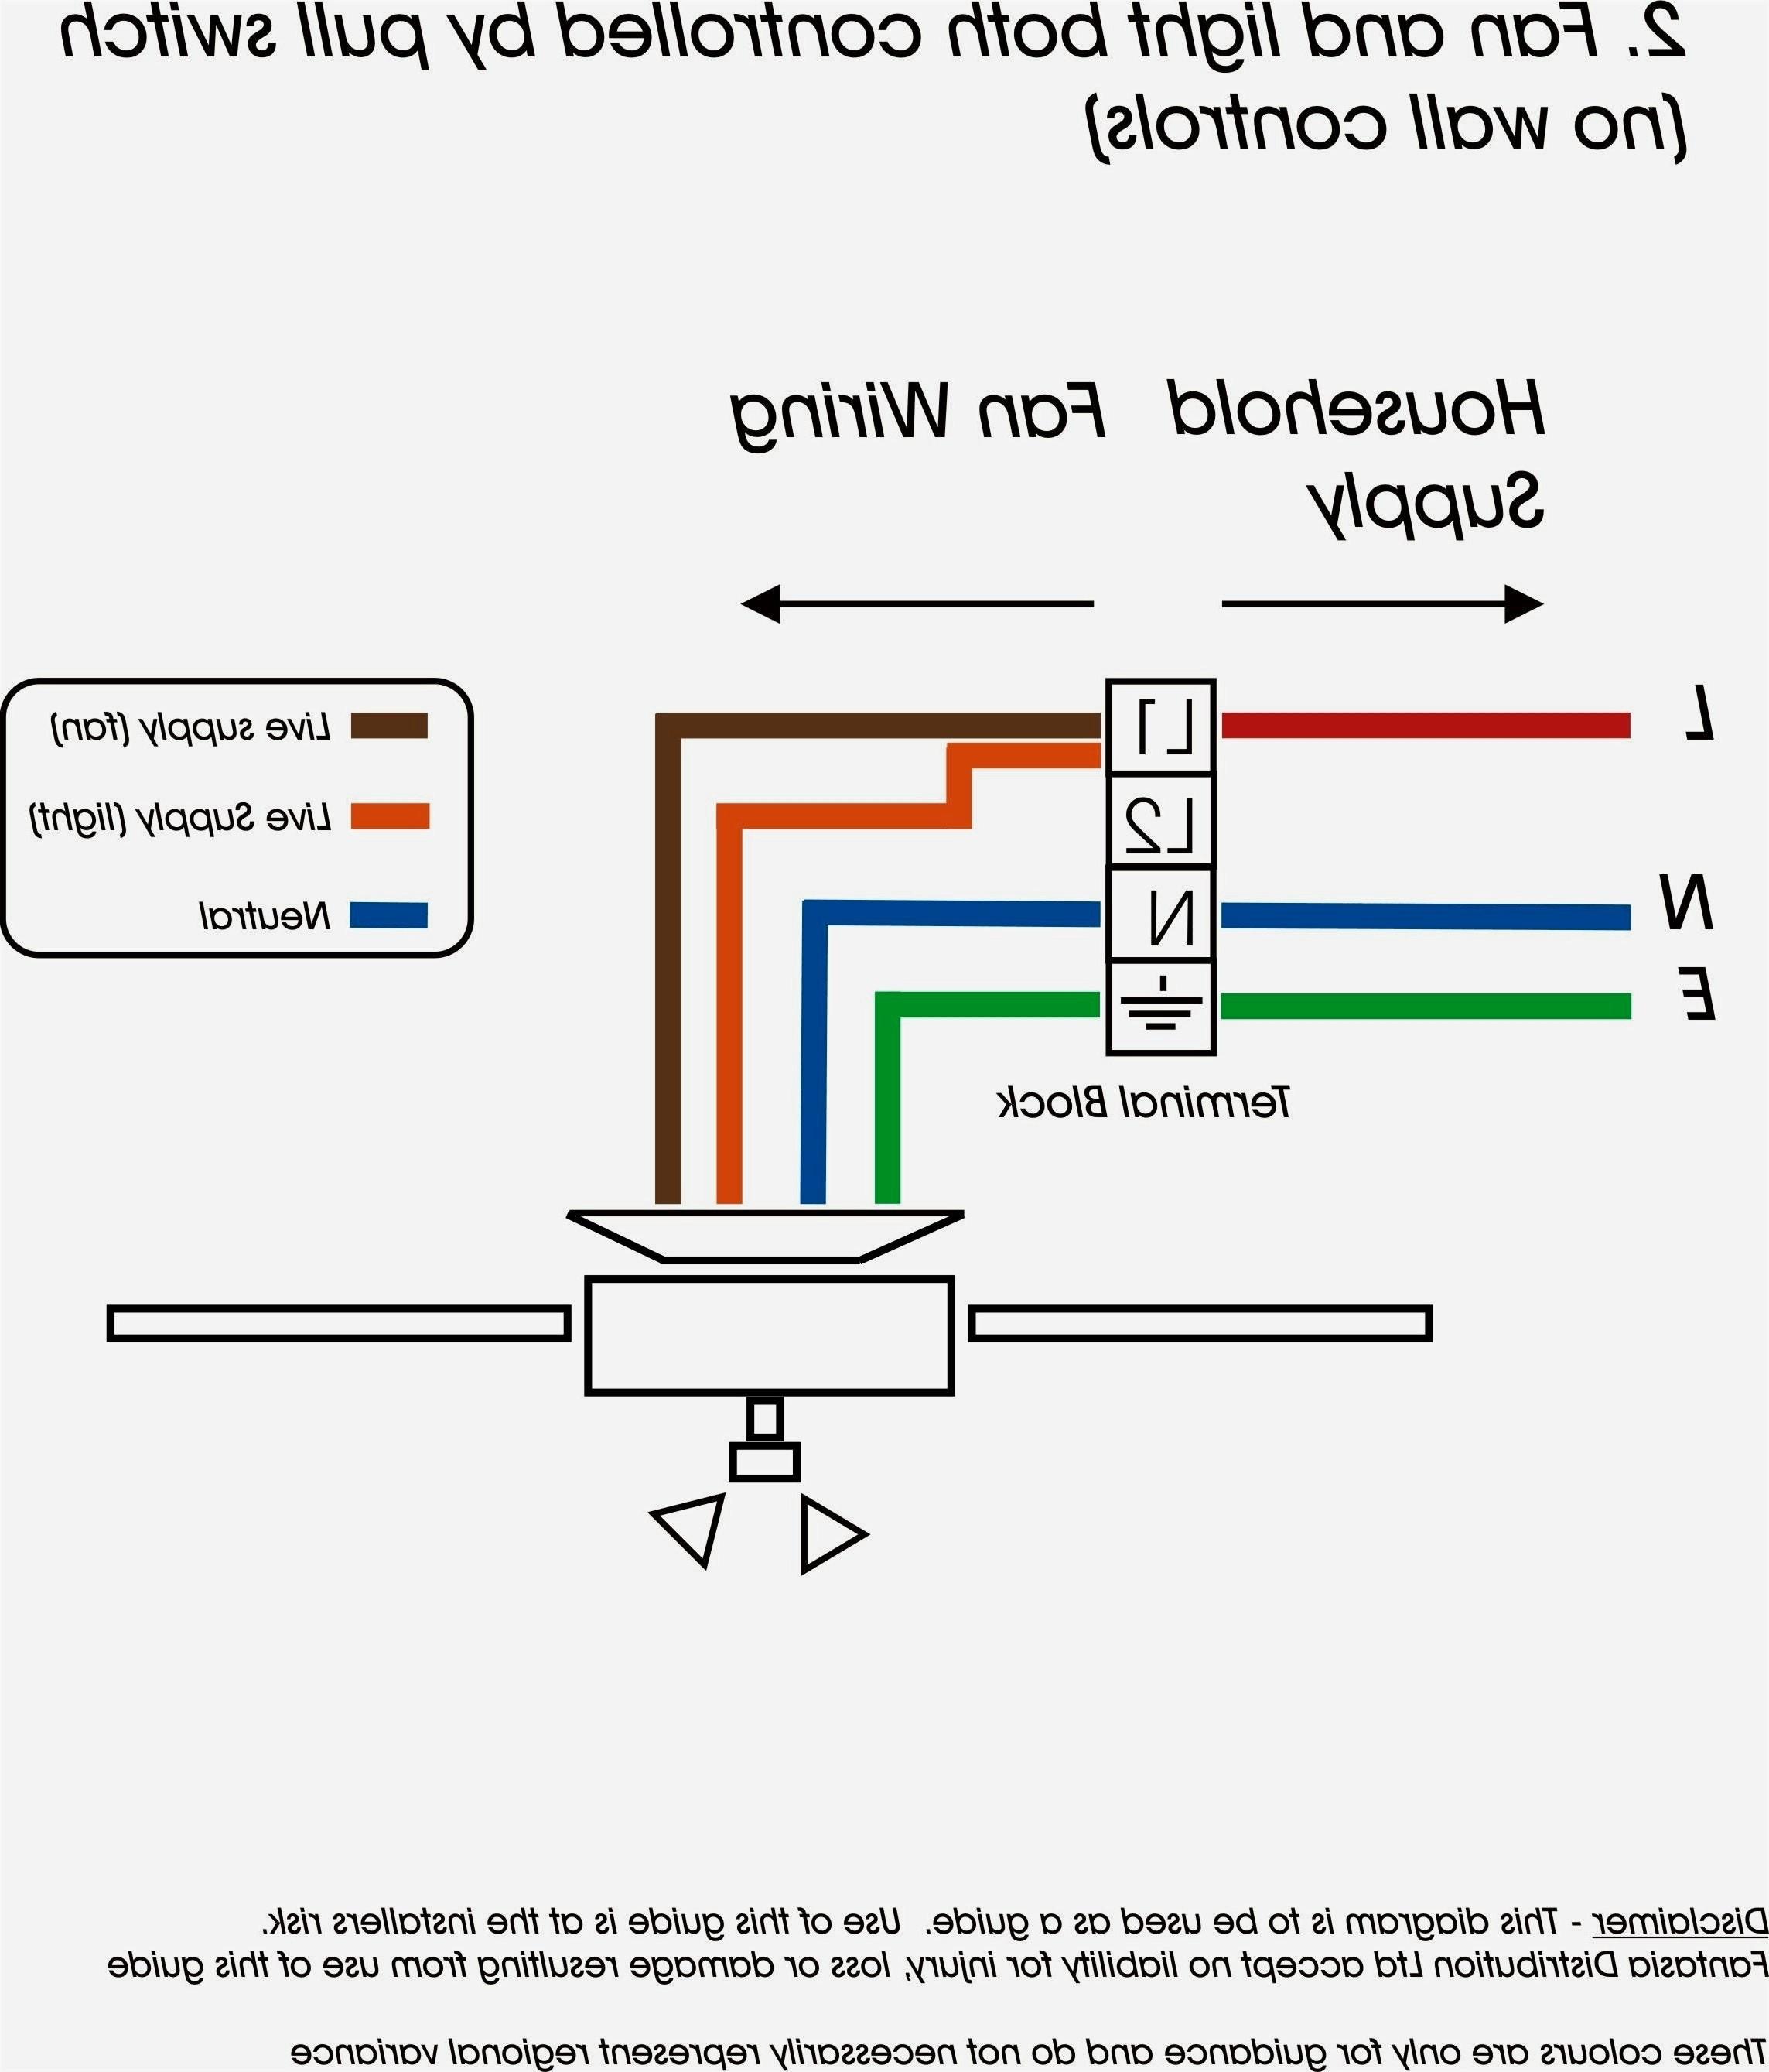 basic bathroom wiring diagram Download-Wiring Diagram For Bathroom Fan With Light Simple Casablanca Fan Wiring Diagram Gallery 7-t